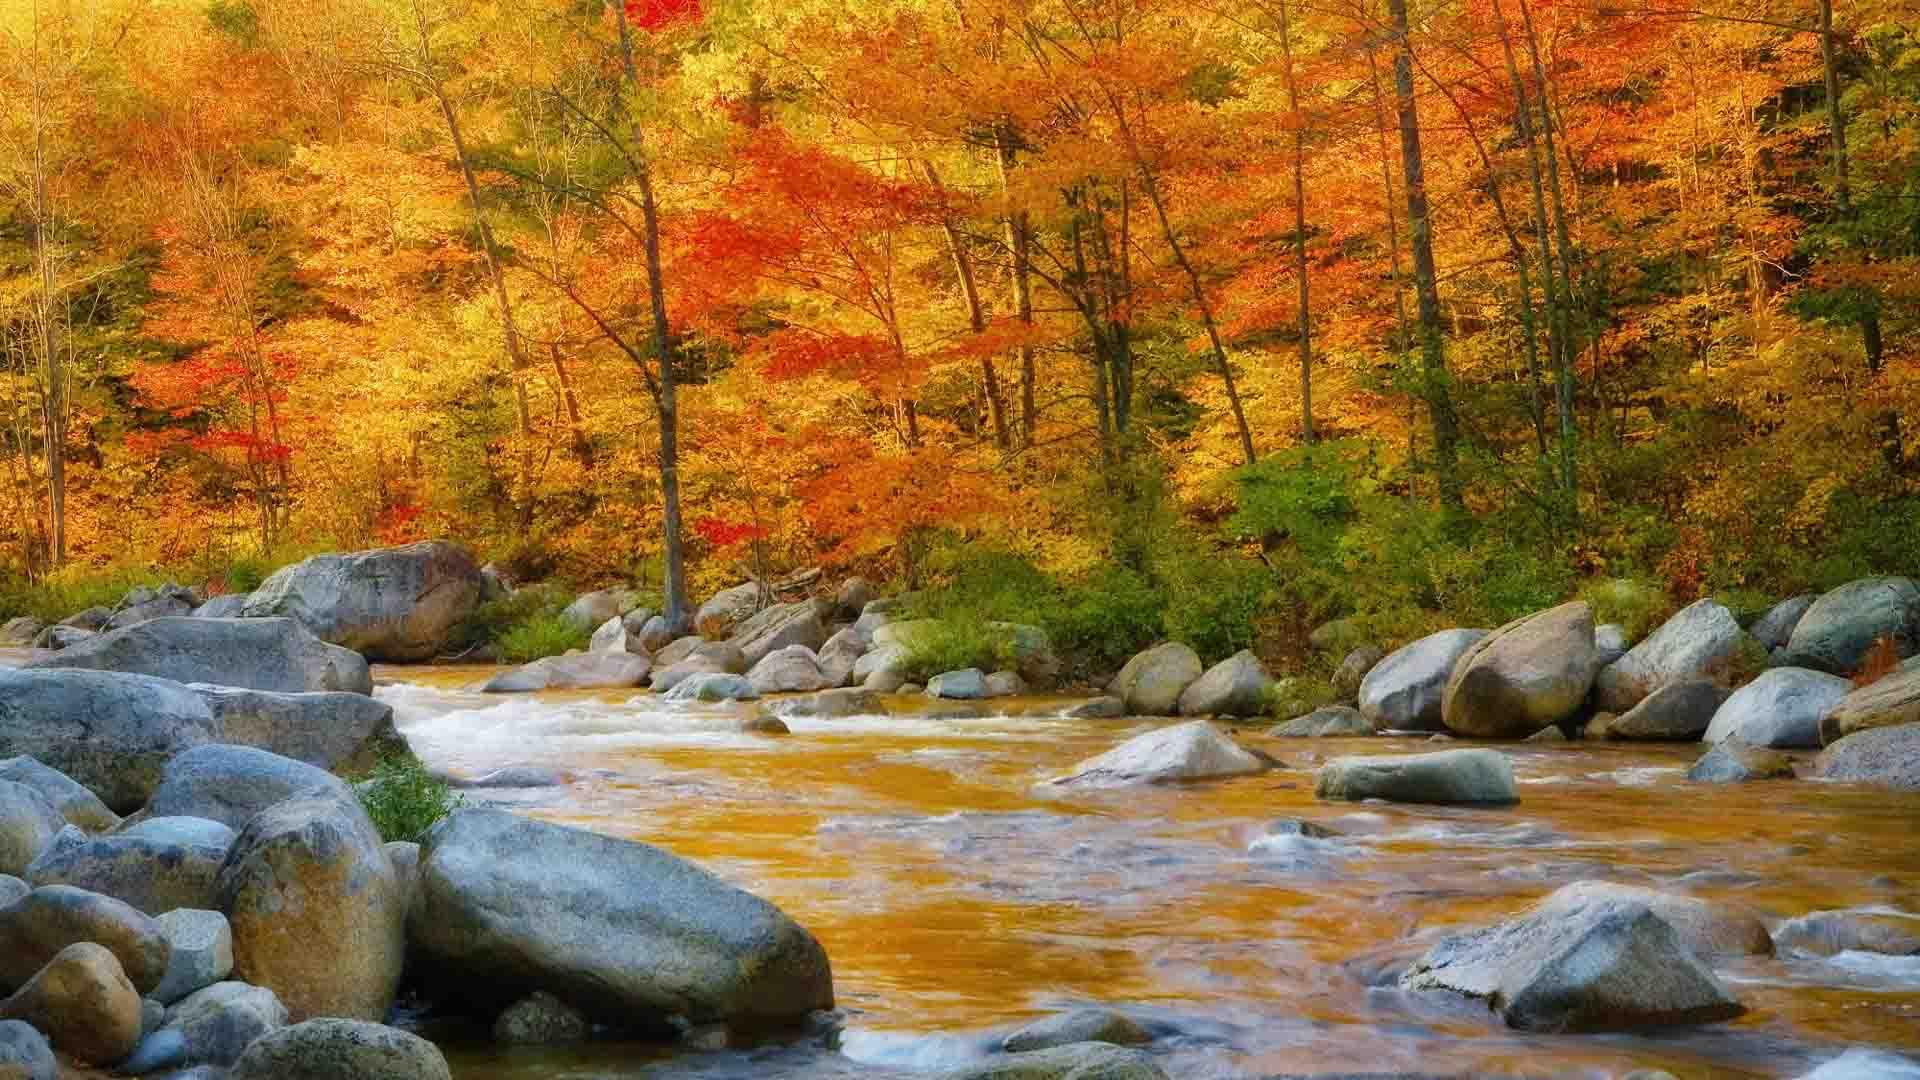 Desktop Wallpaper For Fall Season